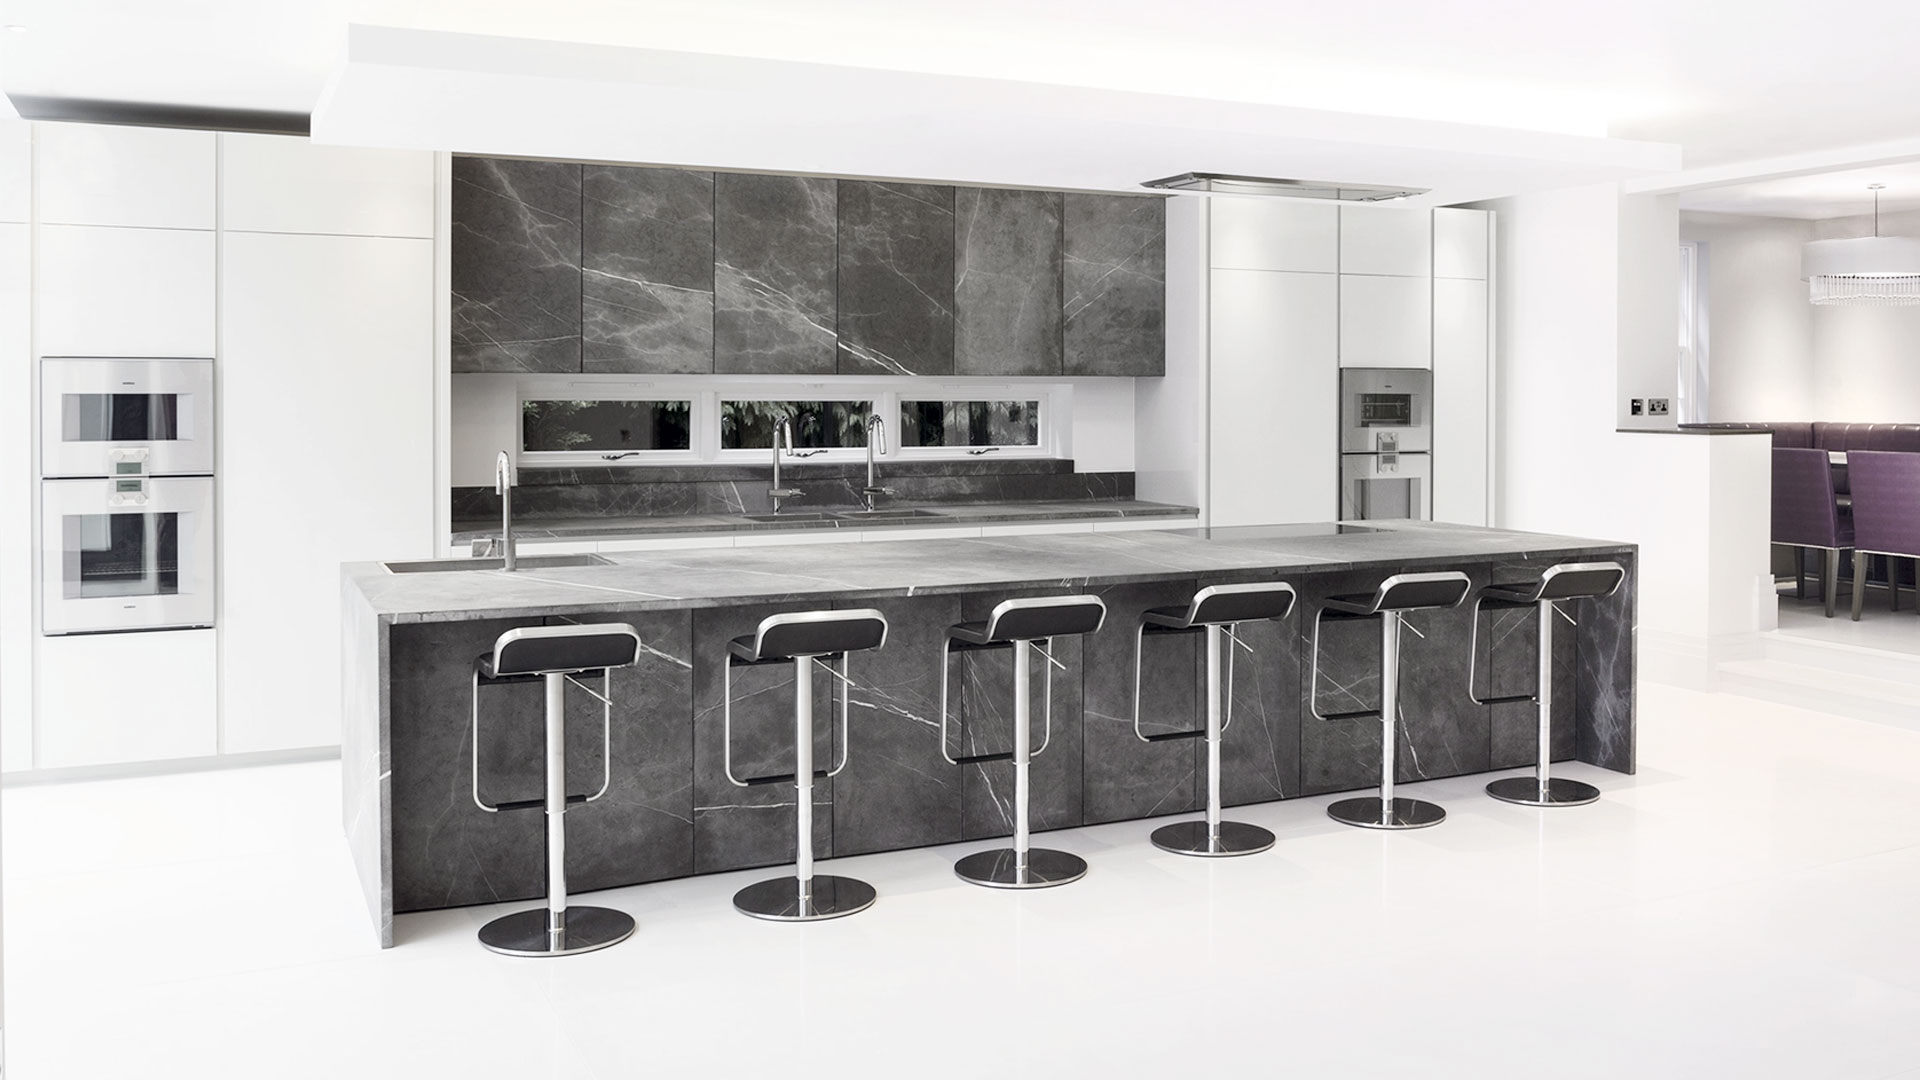 Cucina in pietra con isola - Cucine open space con isola ...